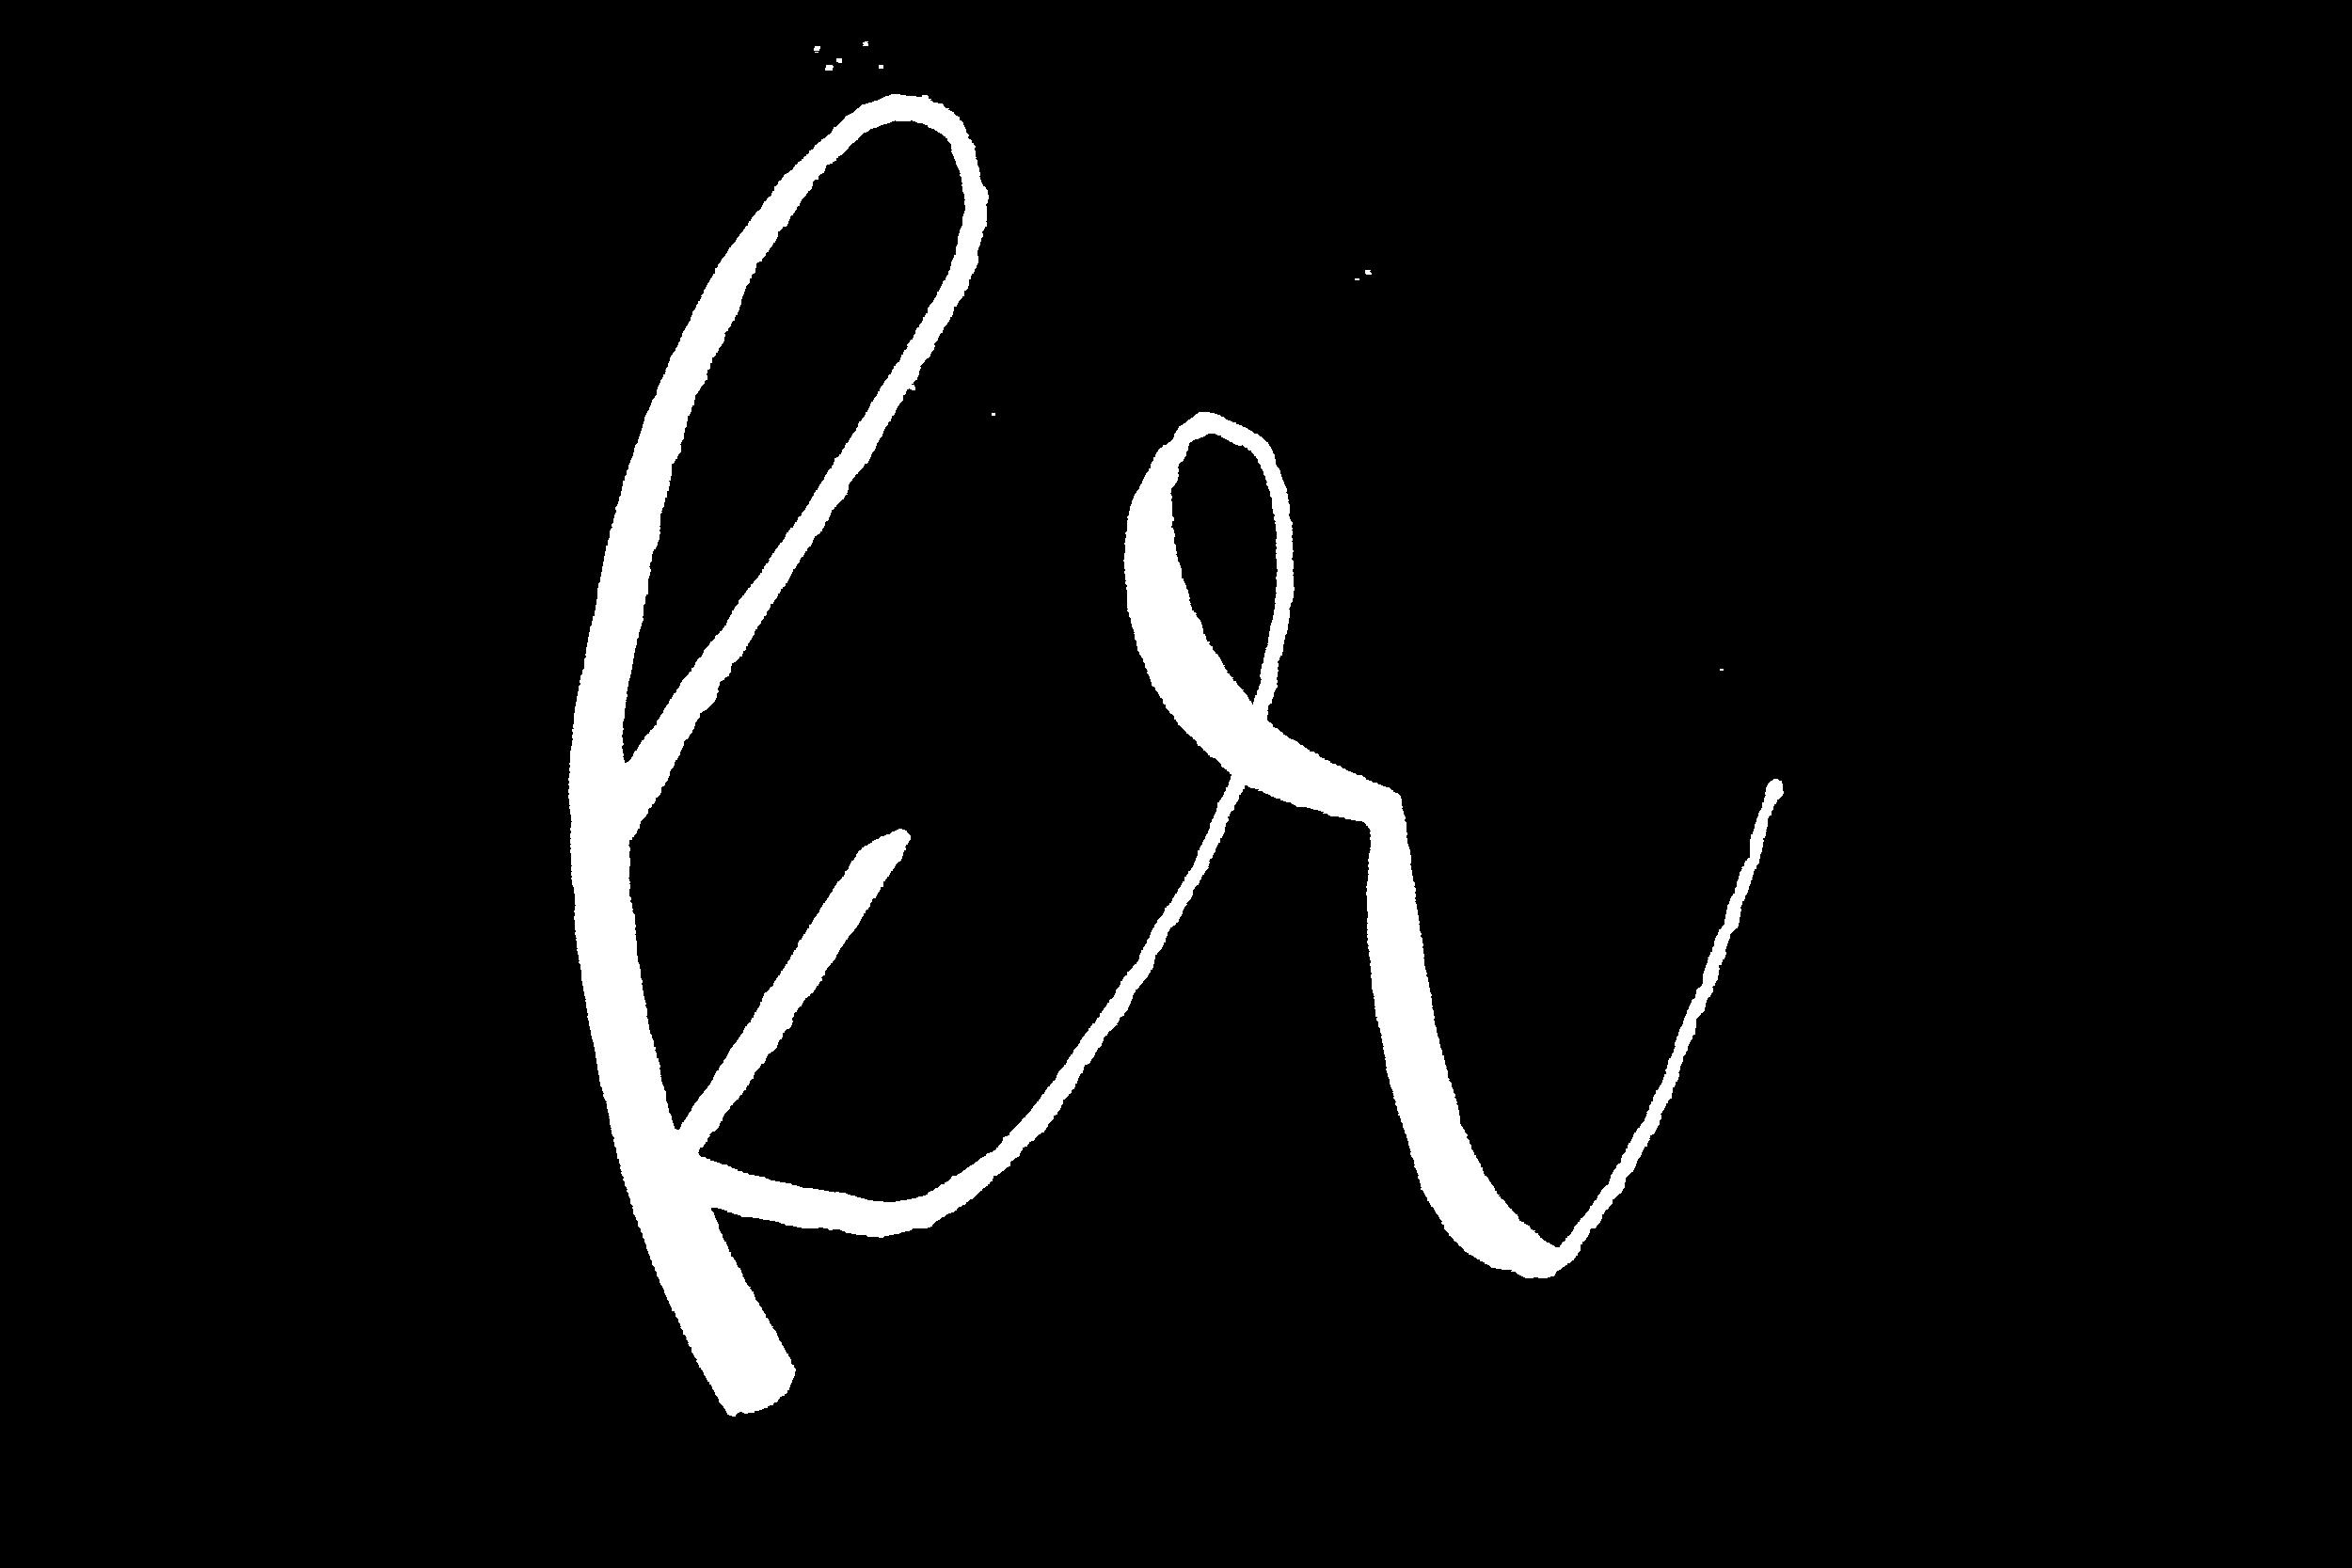 KR.jpg